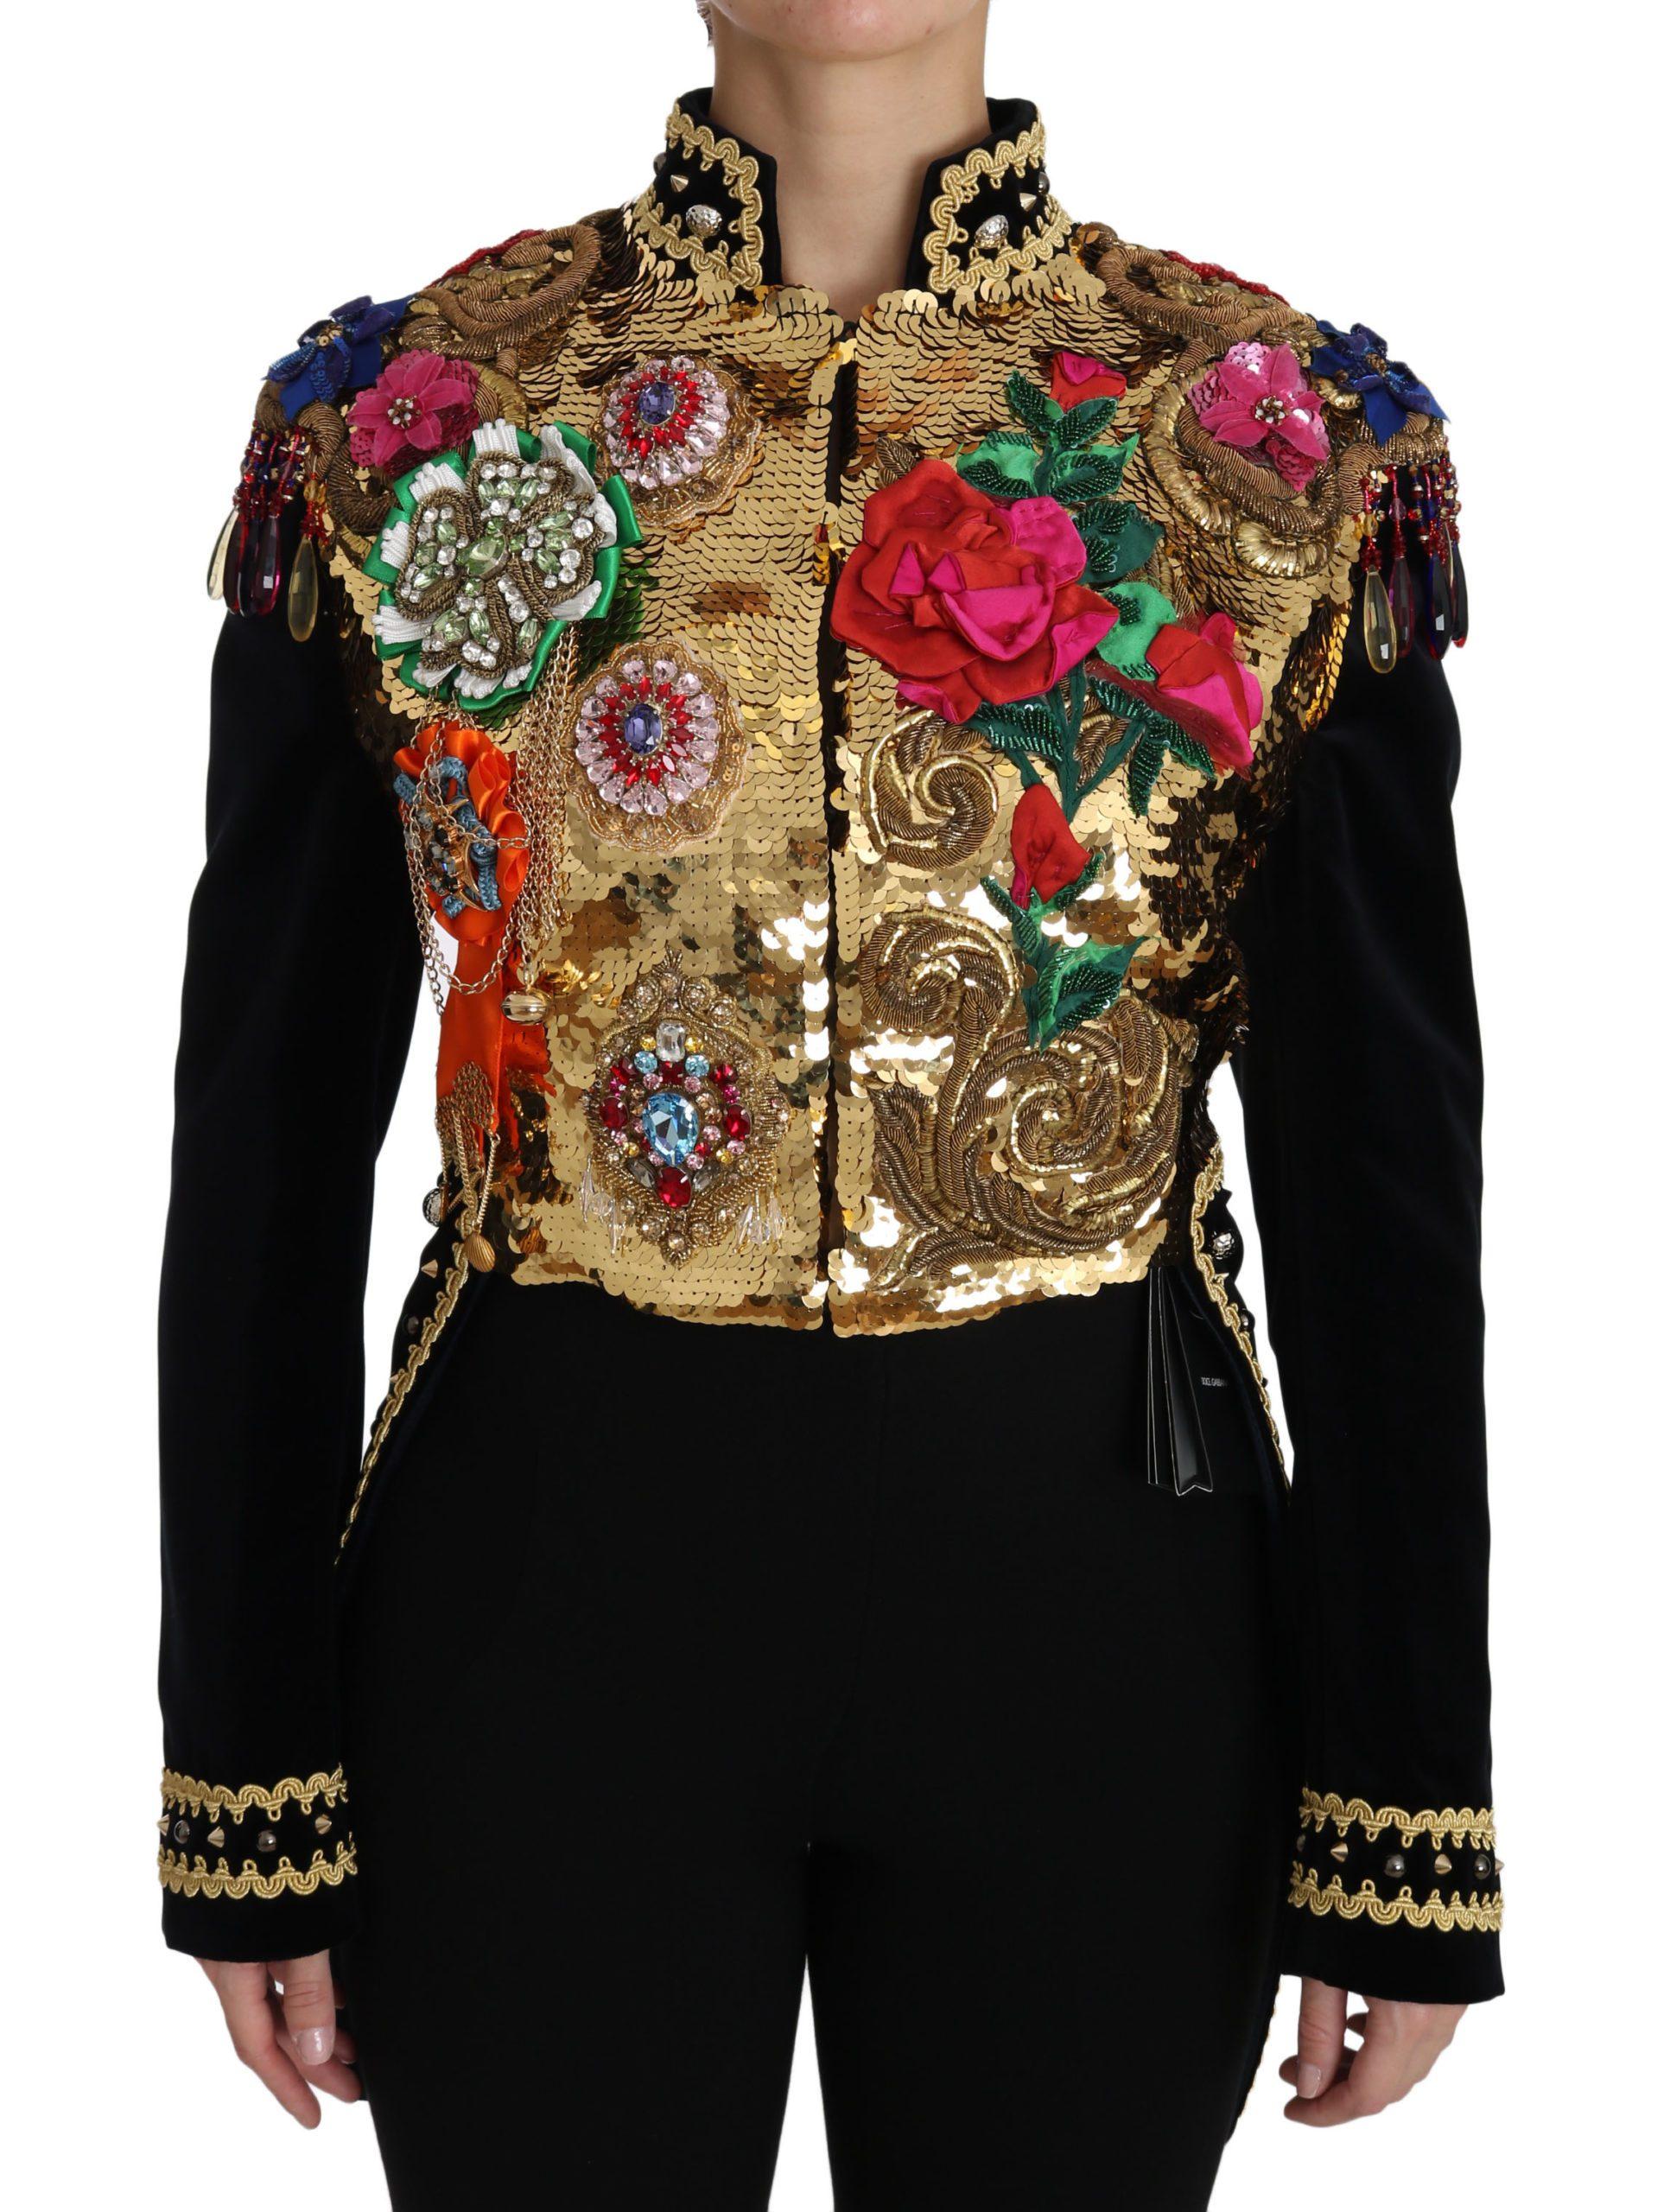 Dolce & Gabbana Women's Crystal Sequined Jacket Black JKT2413 - IT46|XL